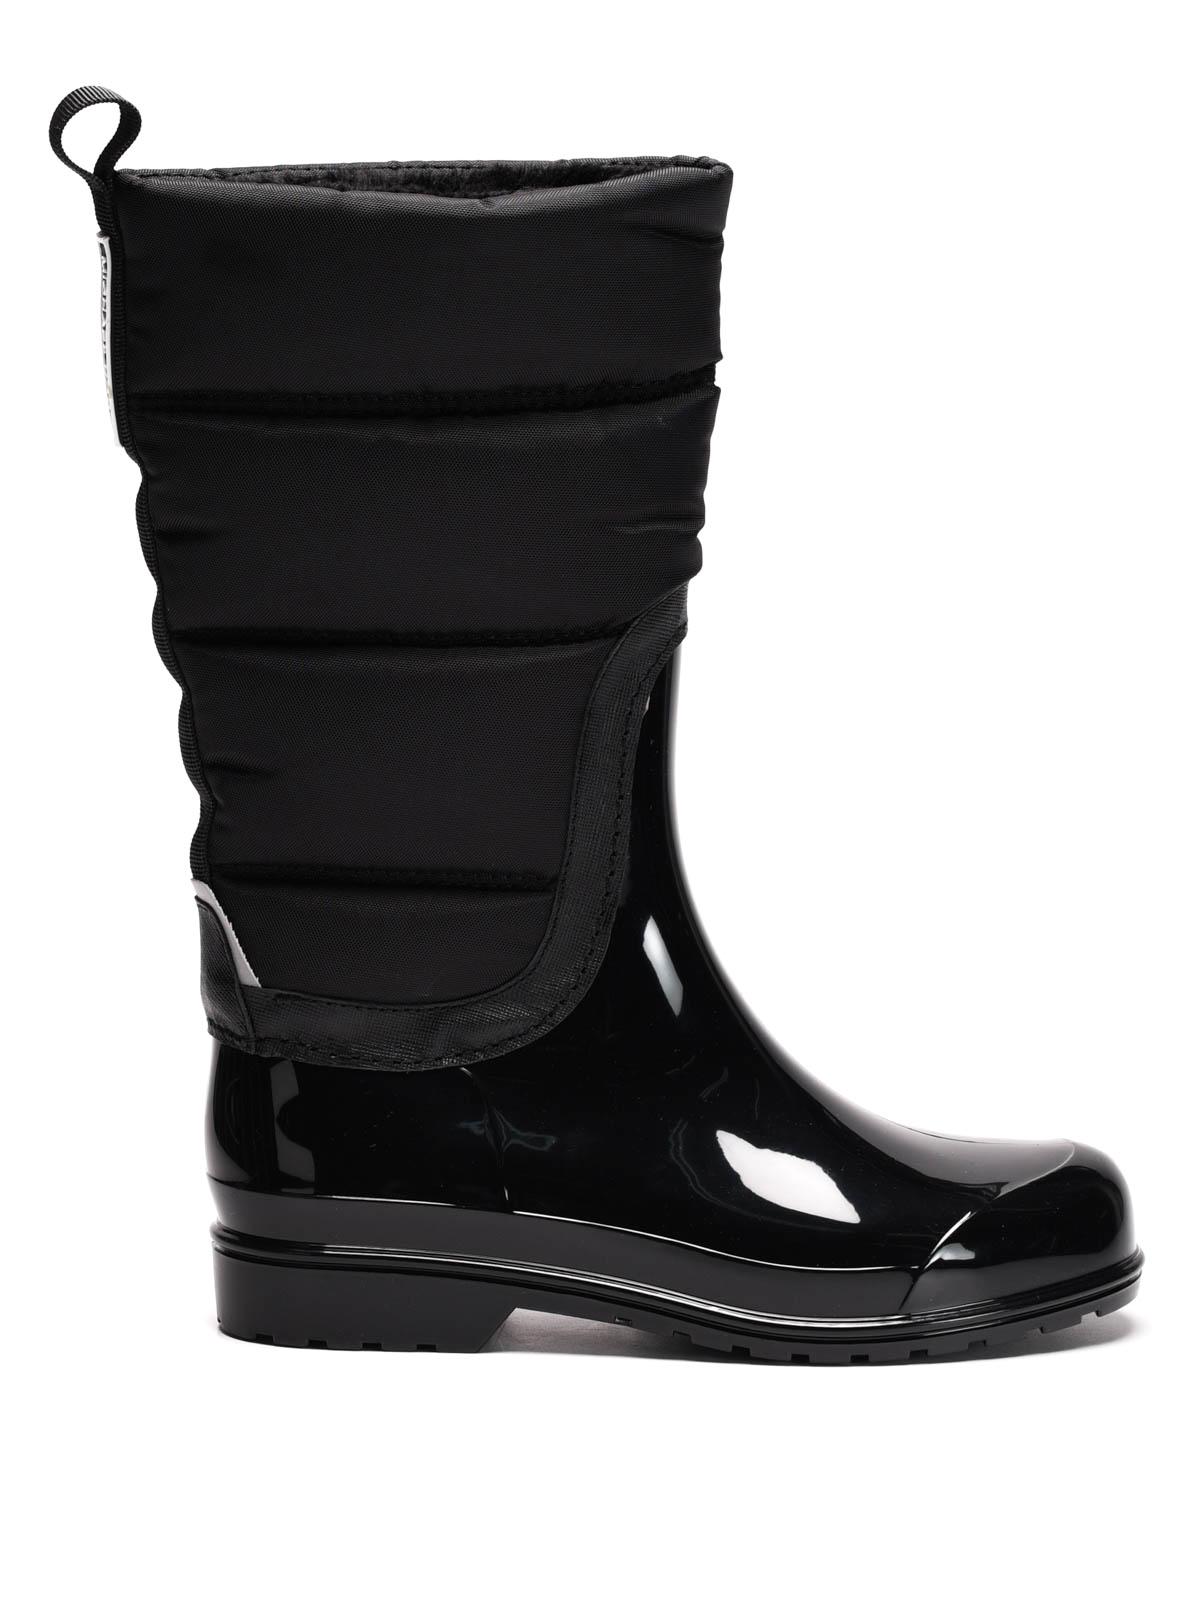 Michael Kors - Cabot rain boots - boots